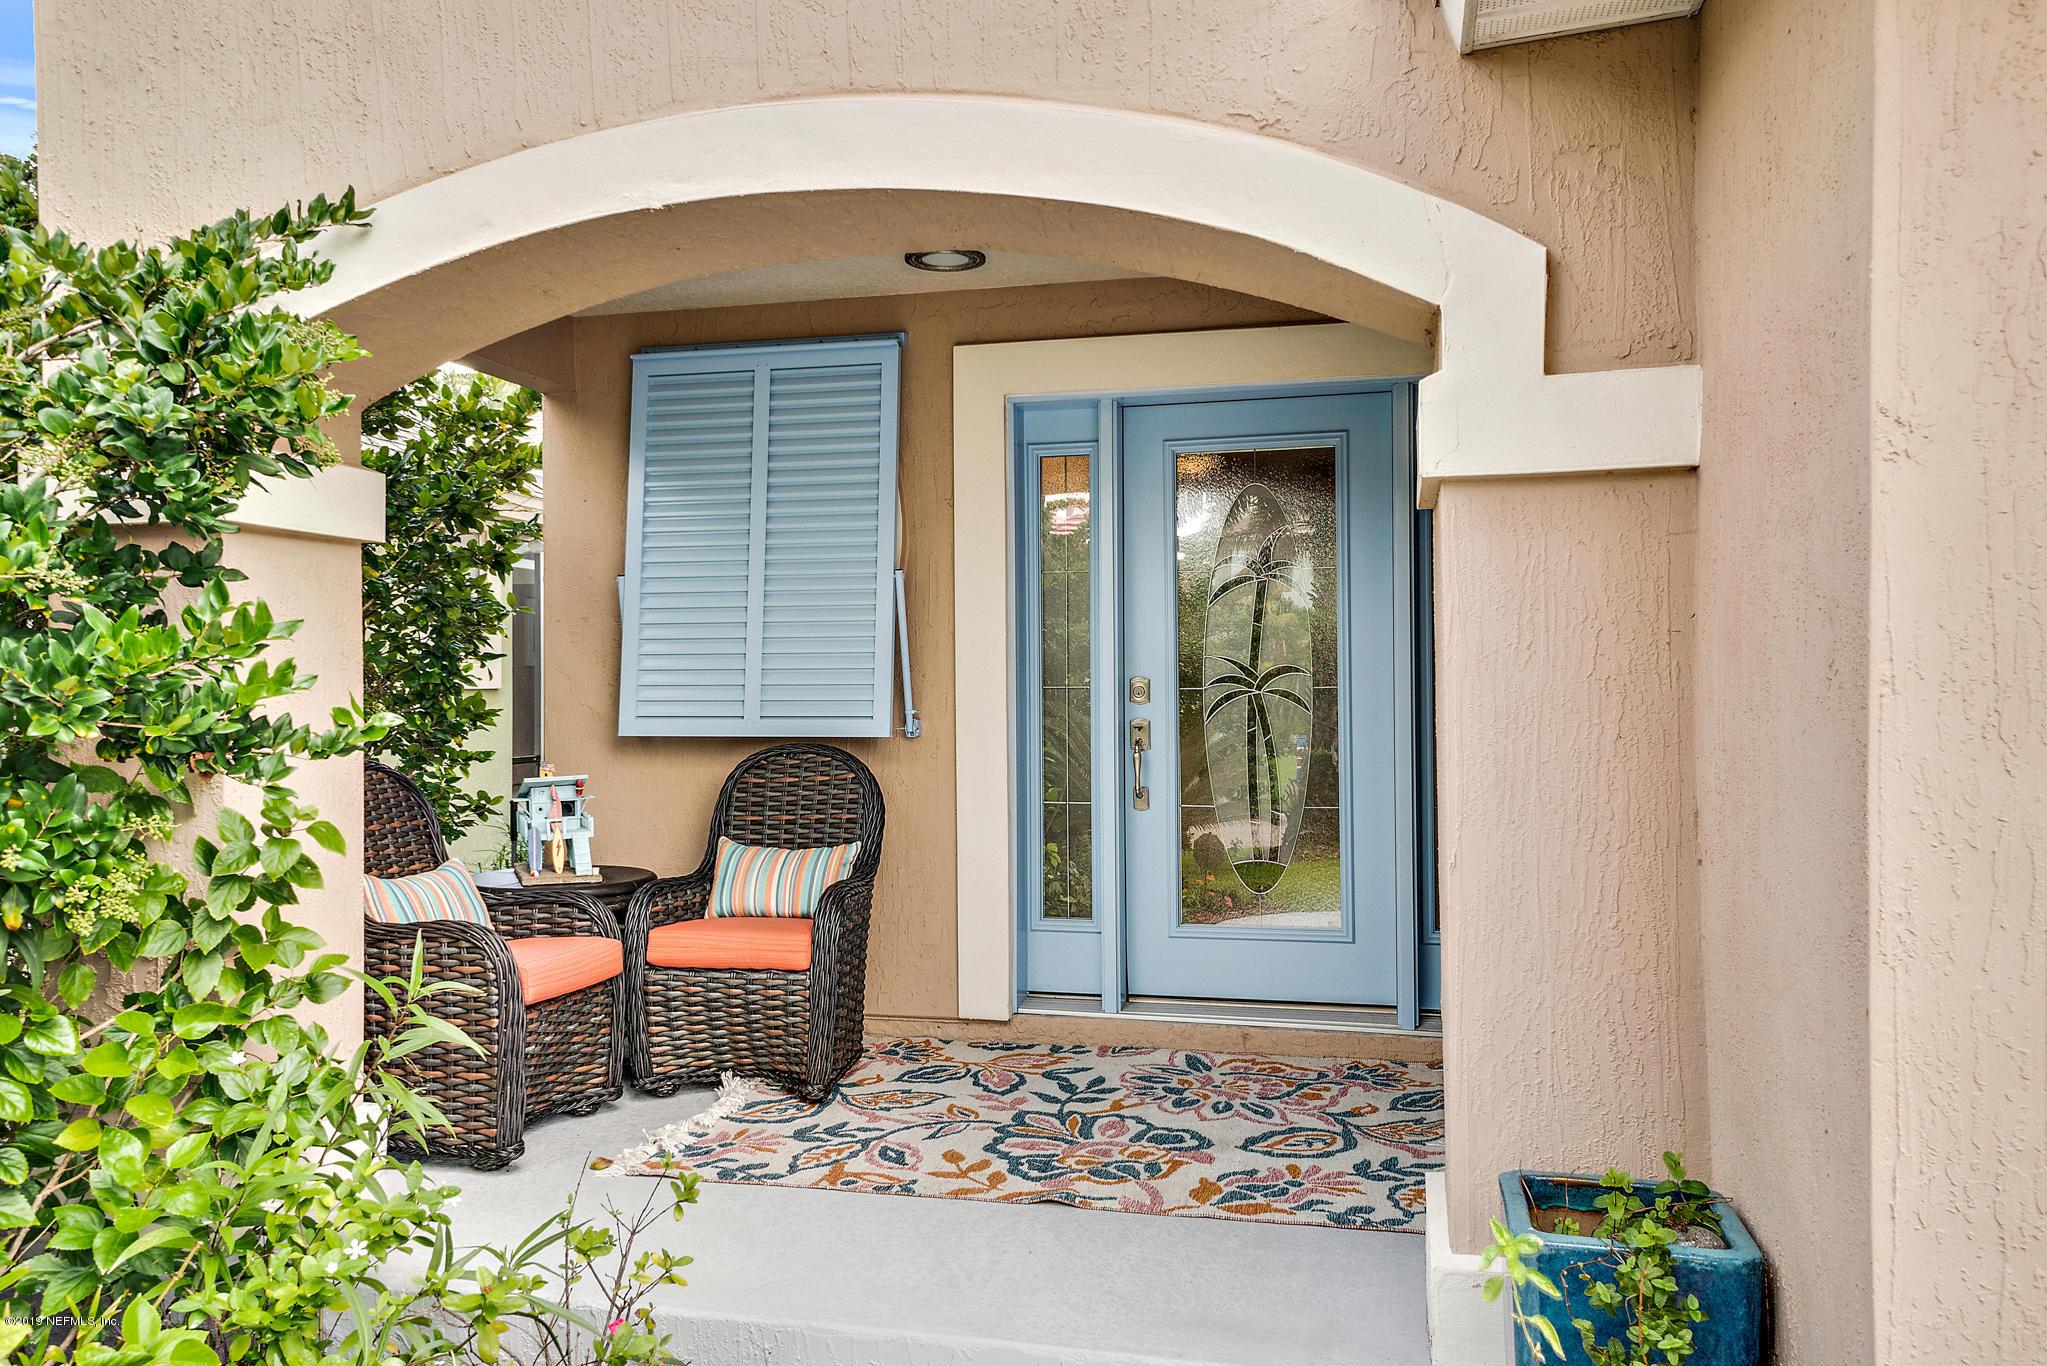 1308 TURTLE DUNES, PONTE VEDRA BEACH, FLORIDA 32082, 5 Bedrooms Bedrooms, ,3 BathroomsBathrooms,Residential - single family,For sale,TURTLE DUNES,979201